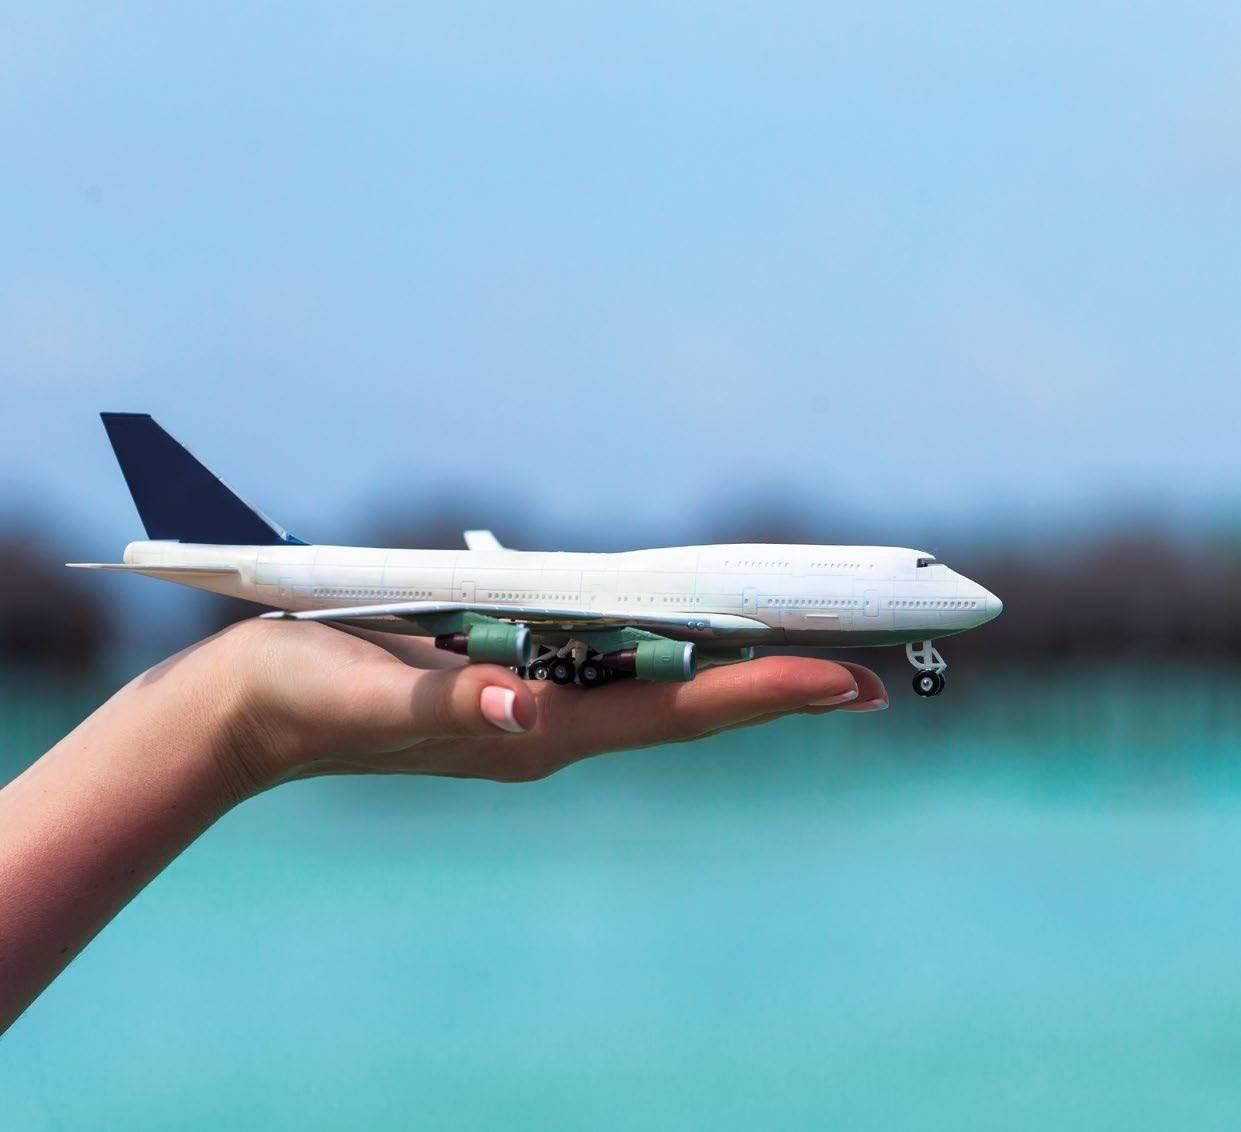 """We Wish You A Pleasant Flight"""